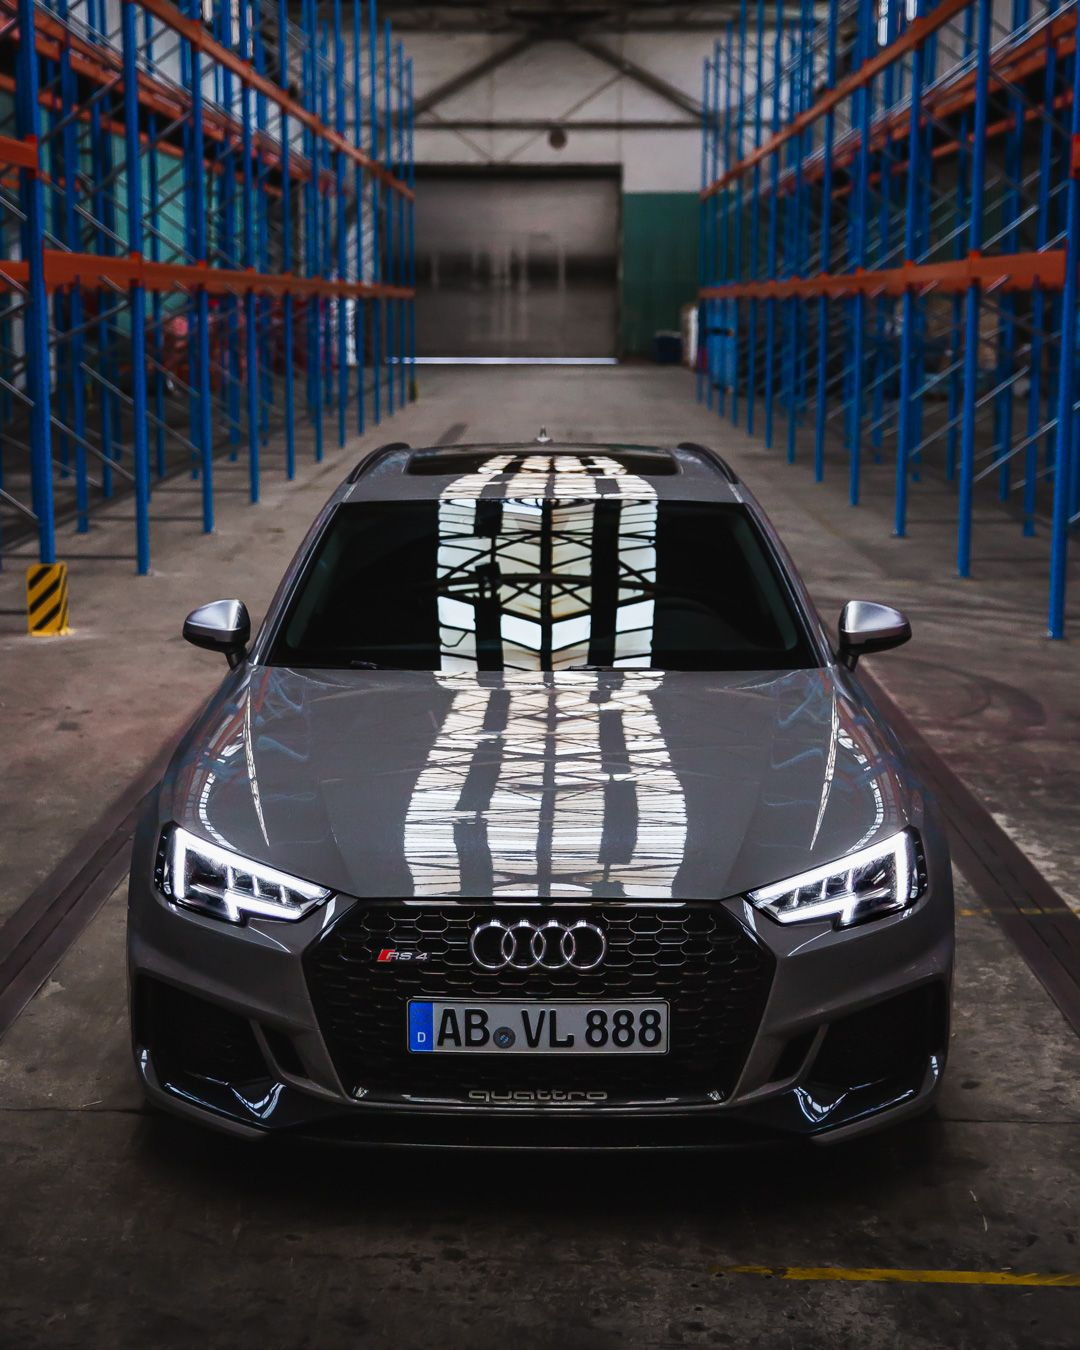 Audi Rs4 Nardo Grey Audi Sport Audi Sport Audi Rs4 Audi